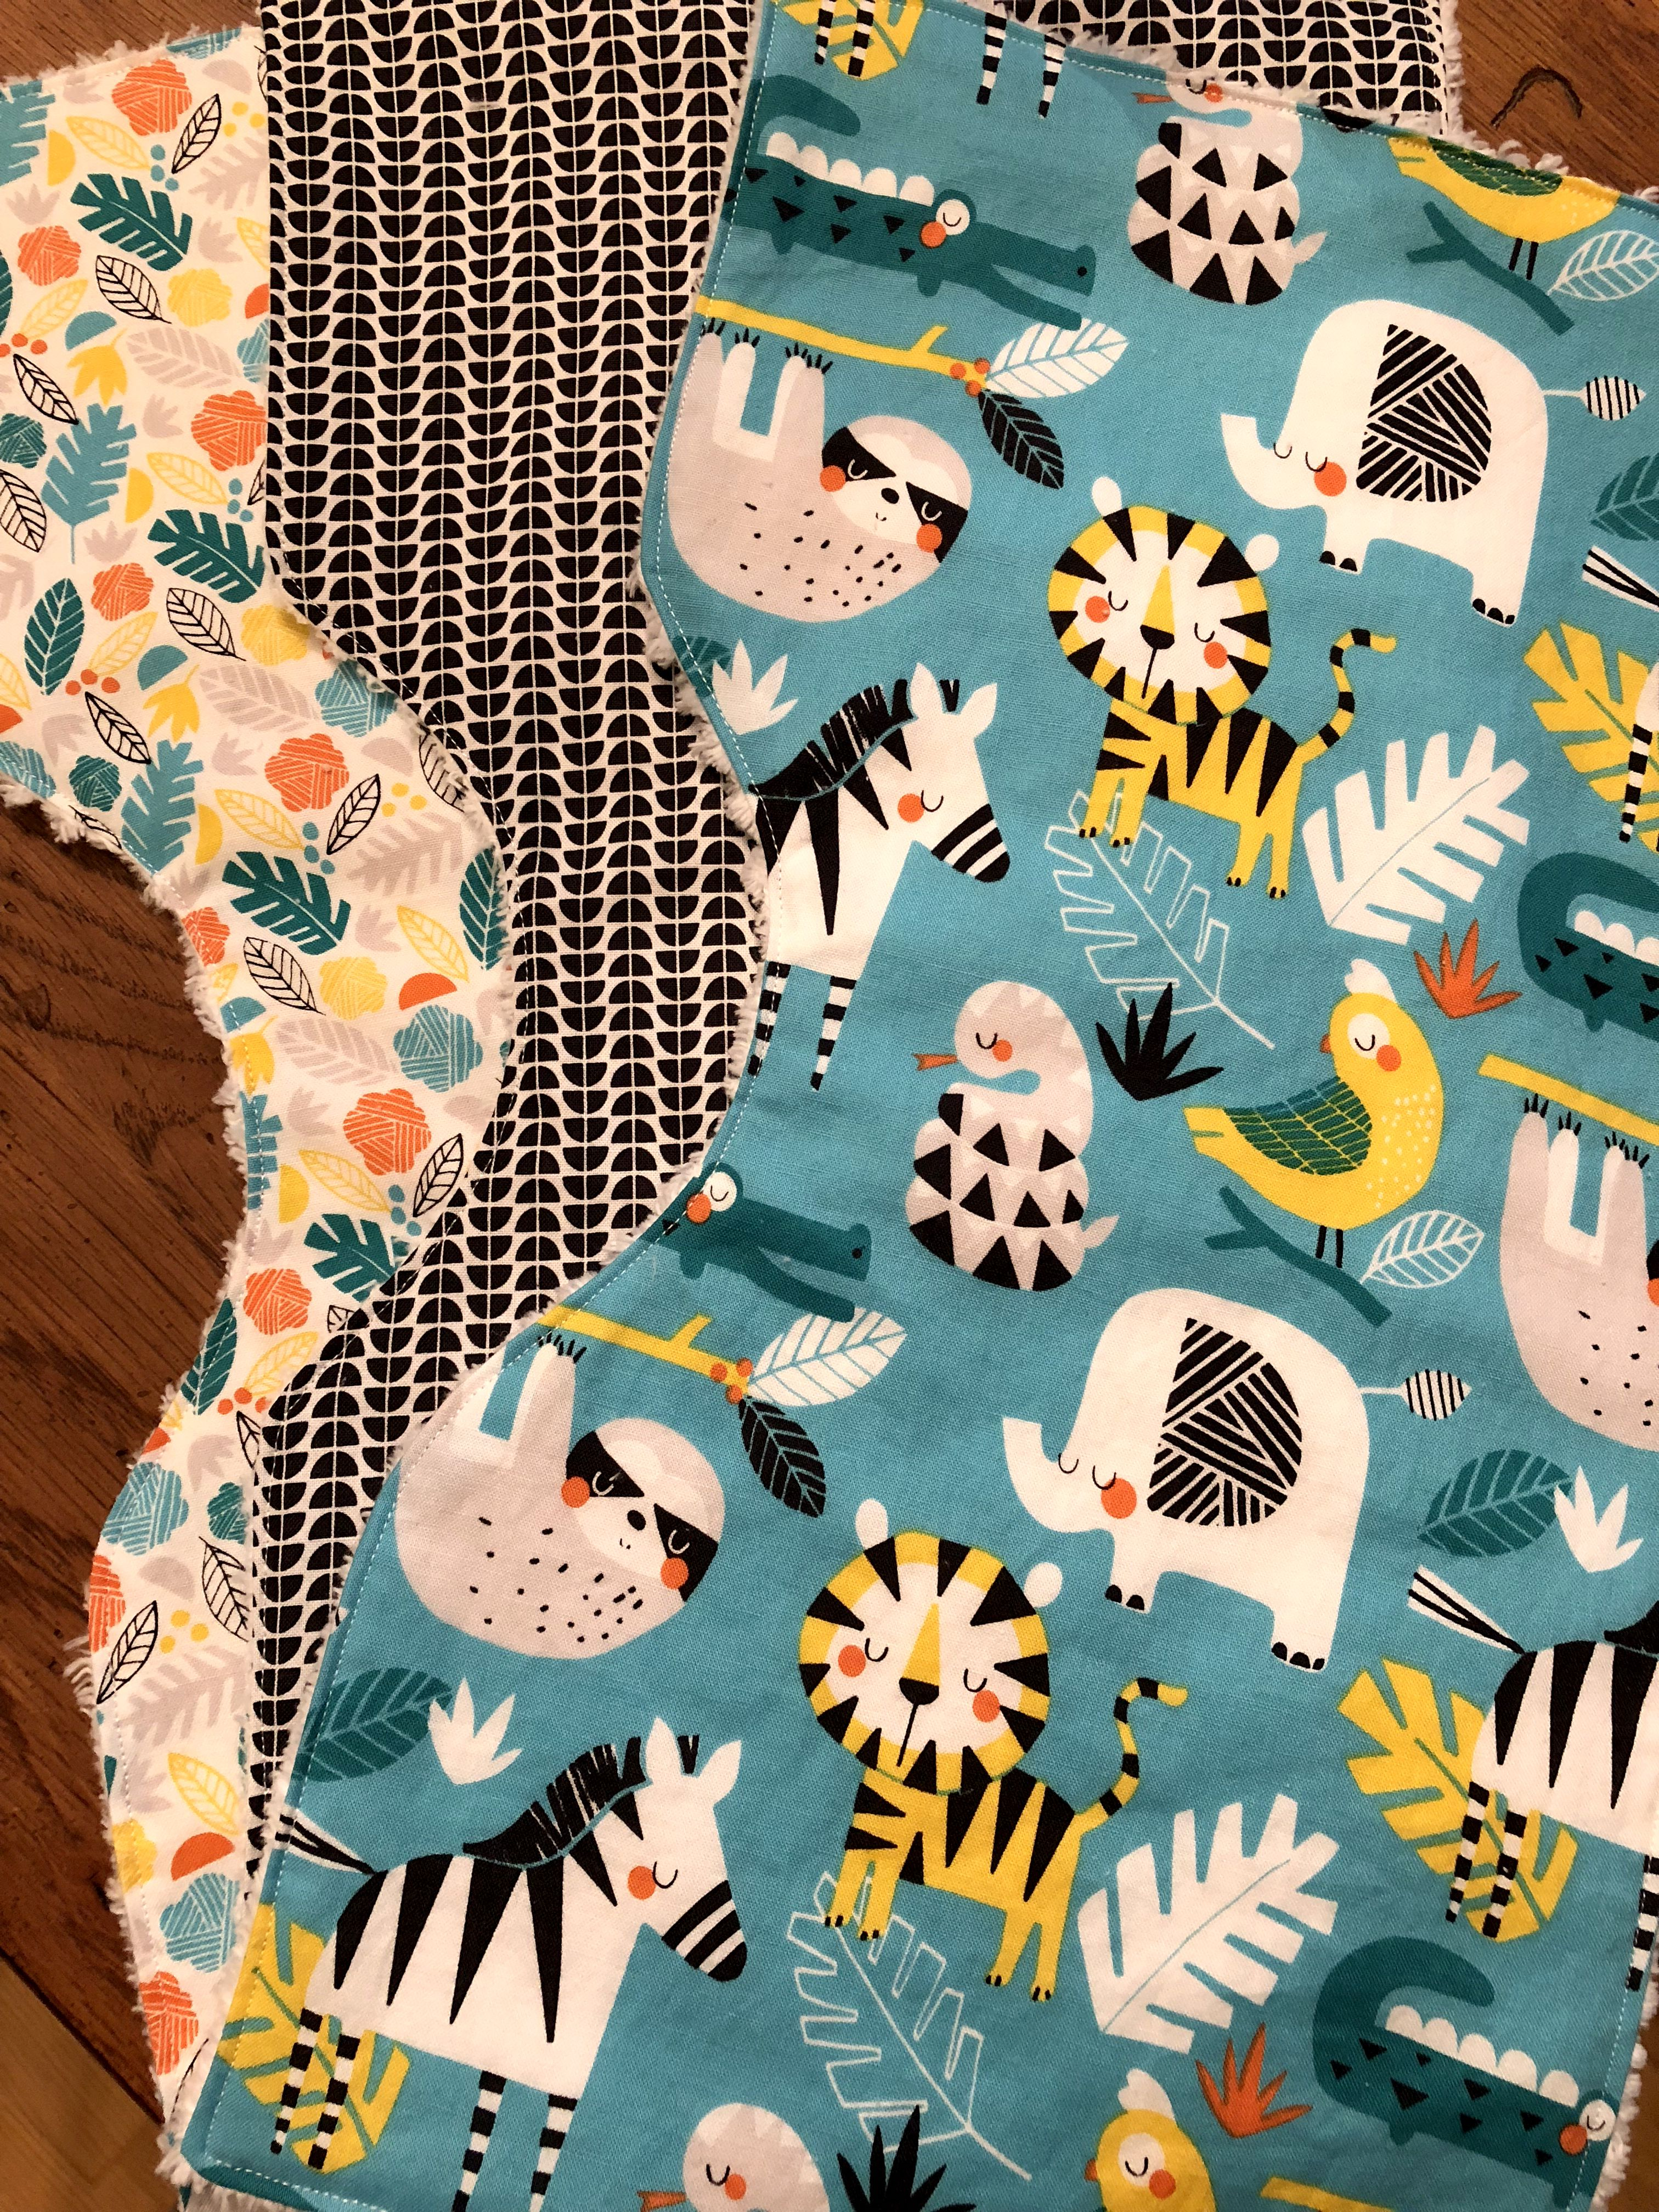 43257886fd08 Baby Burp Cloths, Set of 3, Unisex, Baby Shower Gifts | Brinkmeyer ...